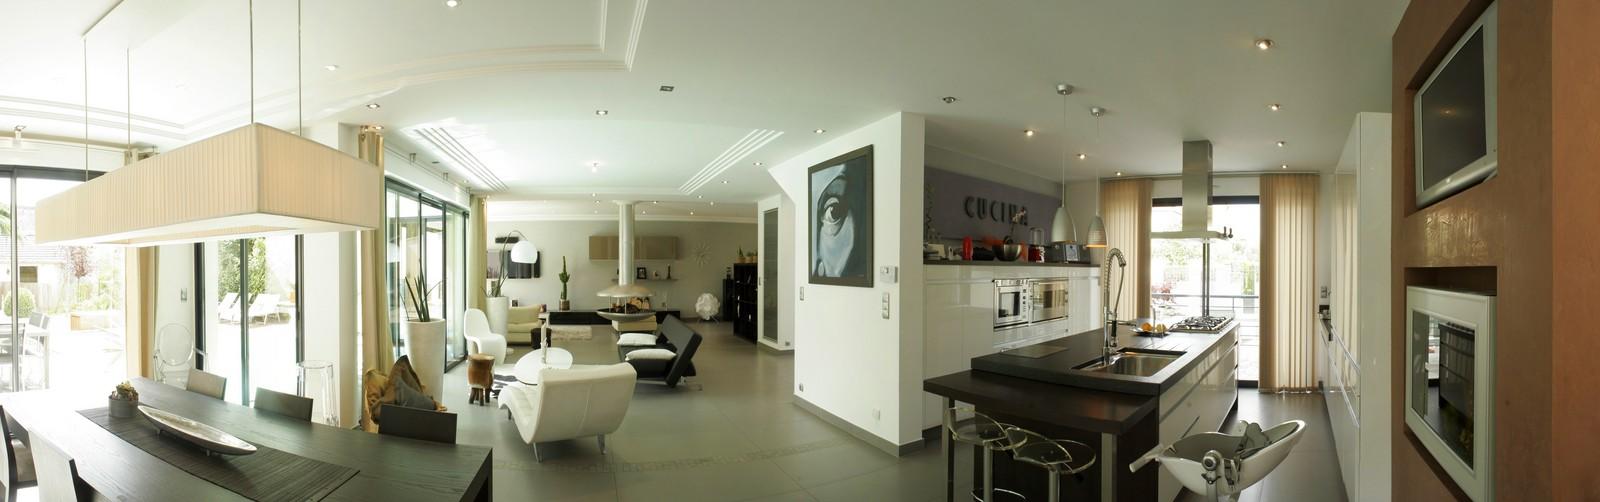 Beautiful Image Interieur De Maison Contemporary - Awesome ...